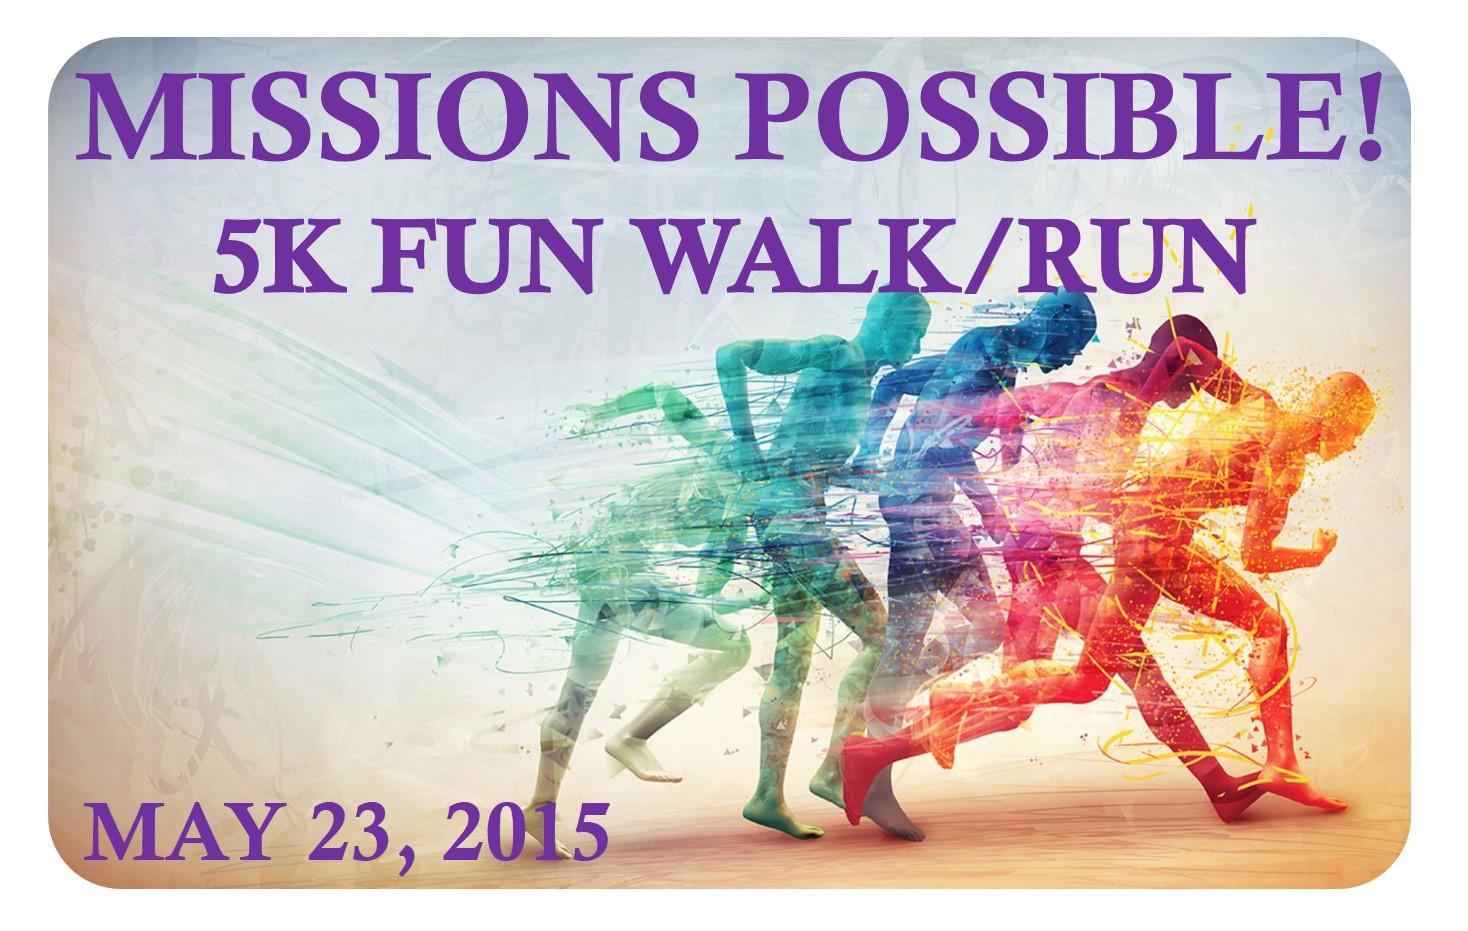 United Check Bag Fee Missions Possible 5k Fun Walk Run